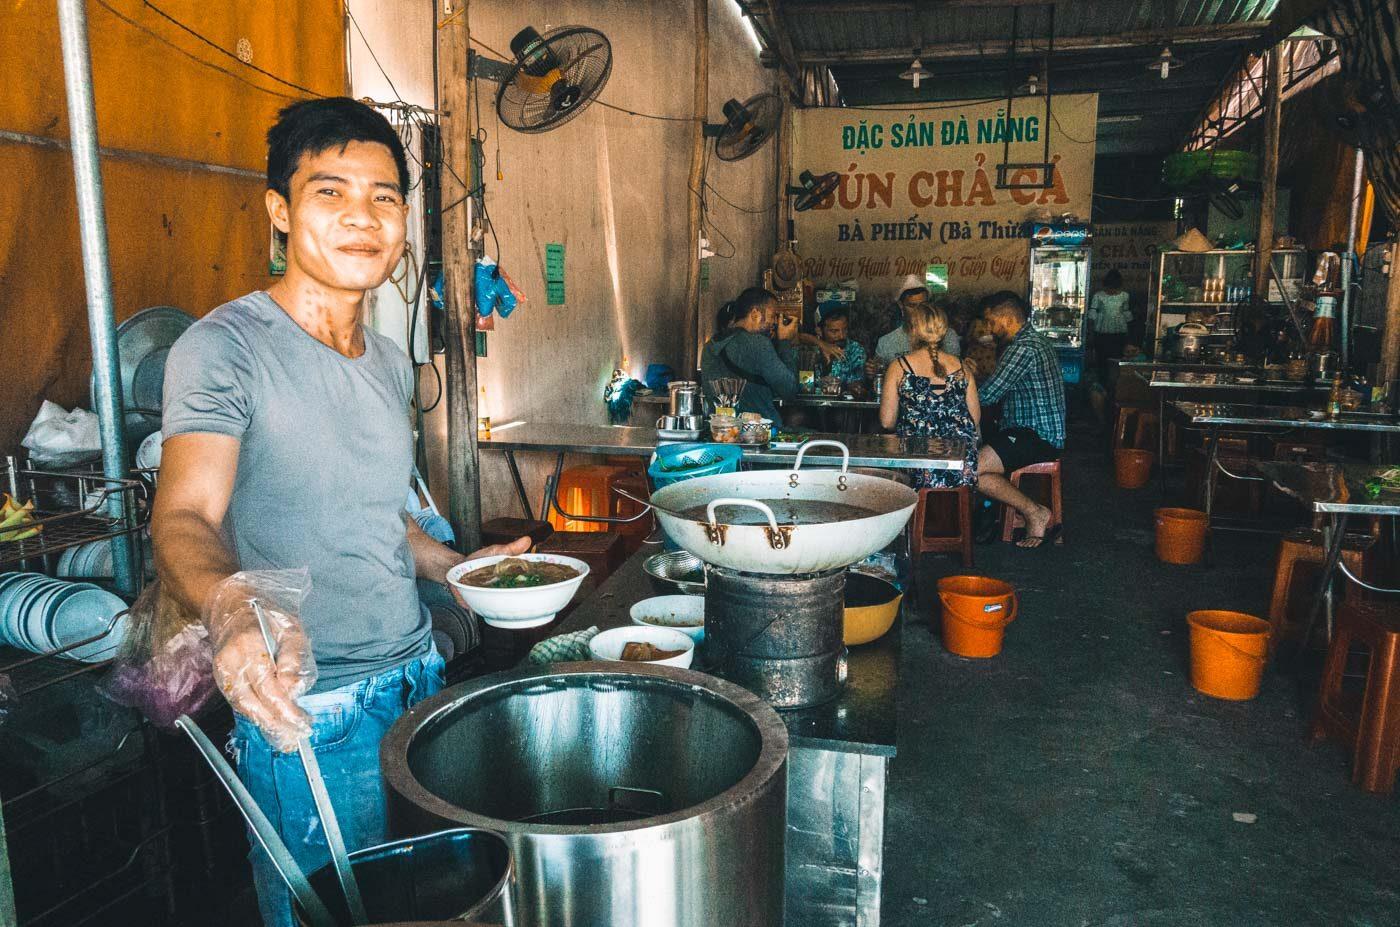 Small locally run restaurant in Hoi An, Vietnam